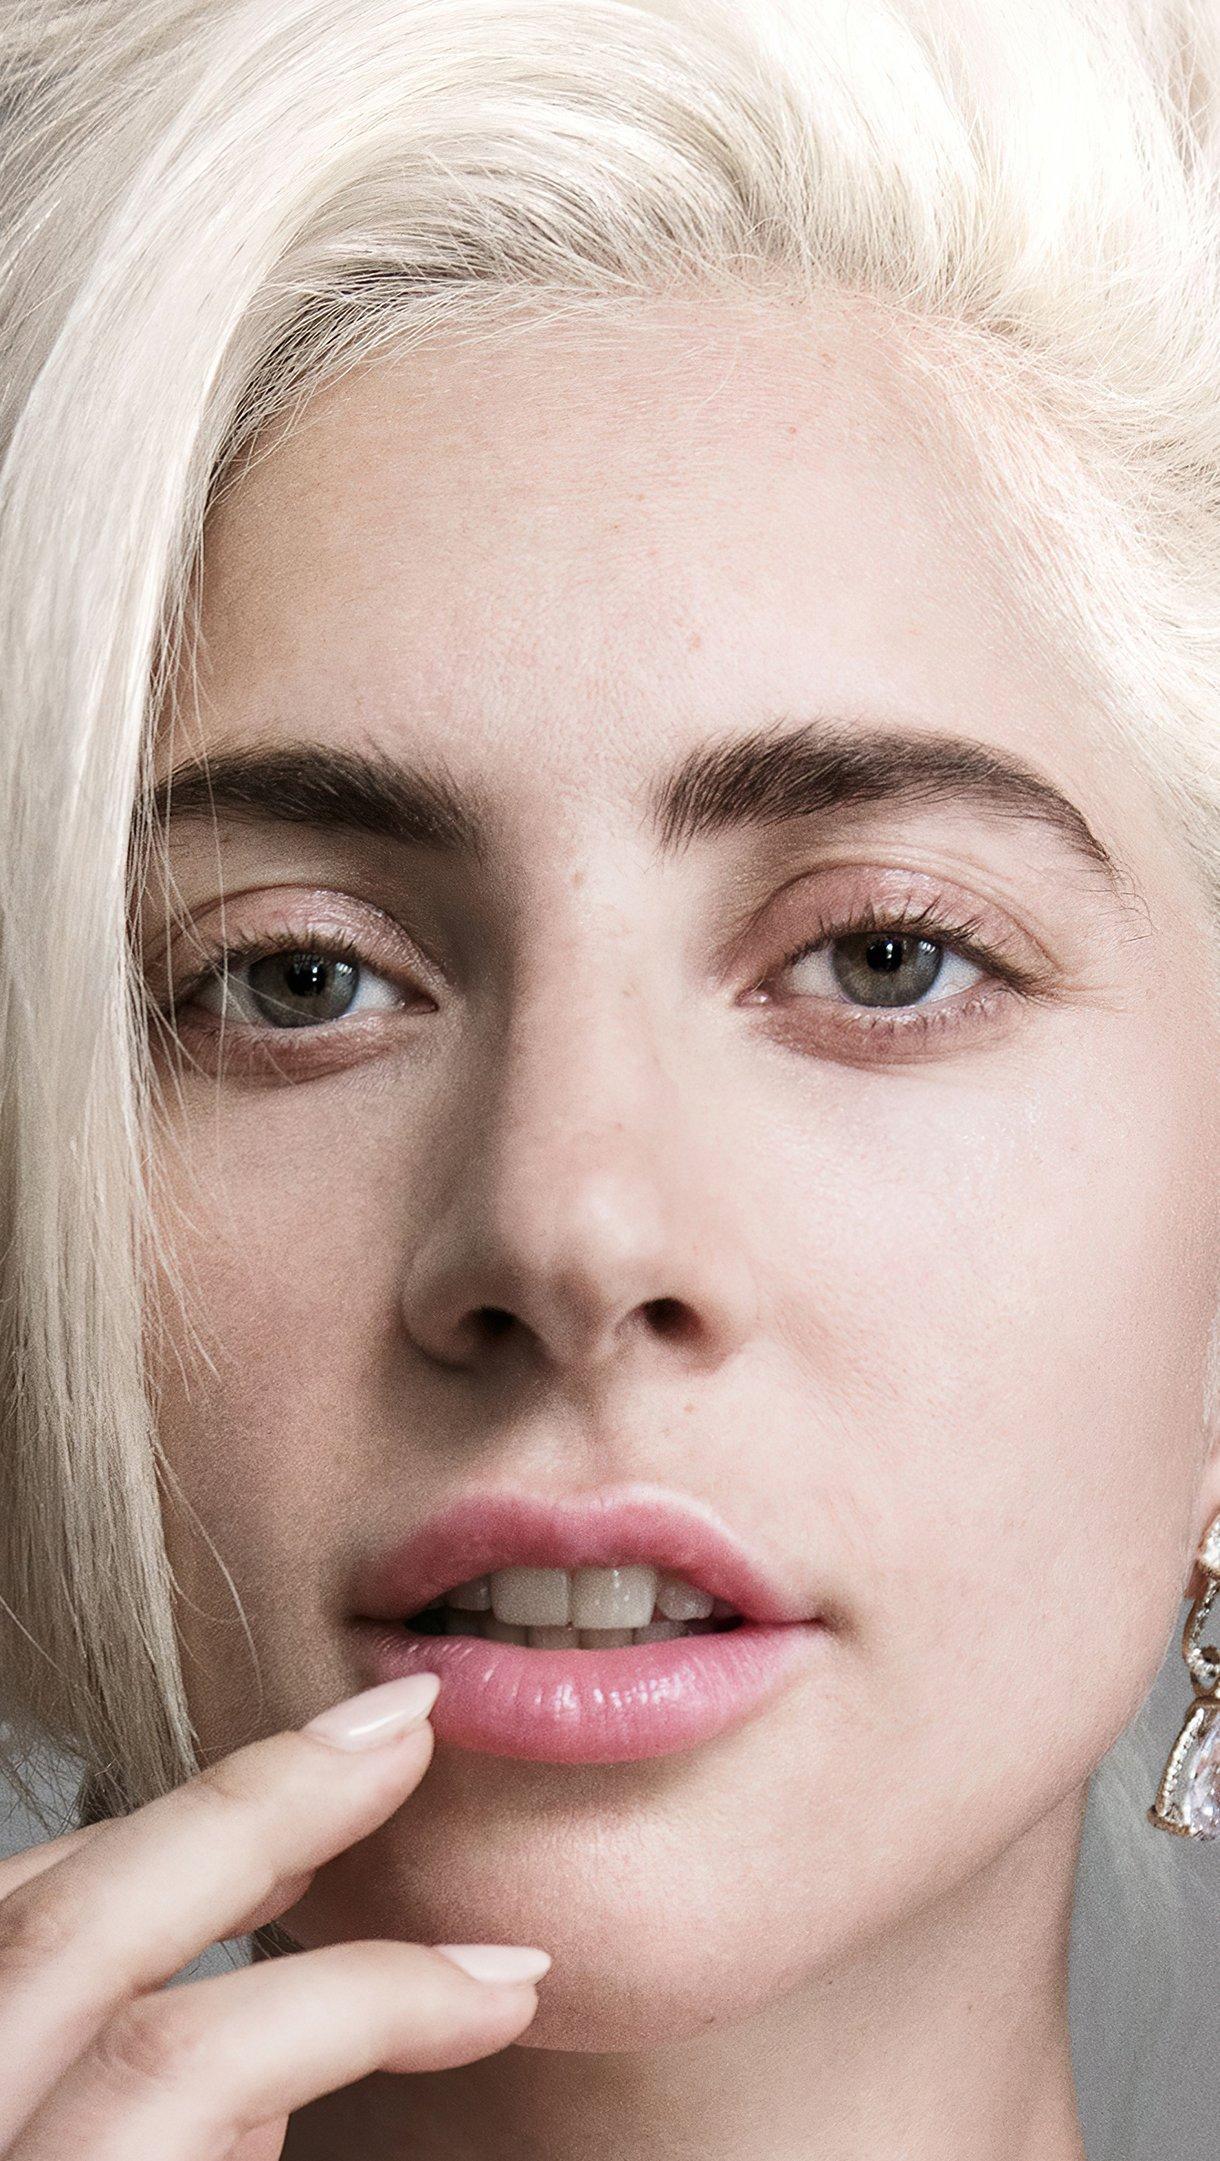 Wallpaper Lady Gaga without makeup 2021 Vertical